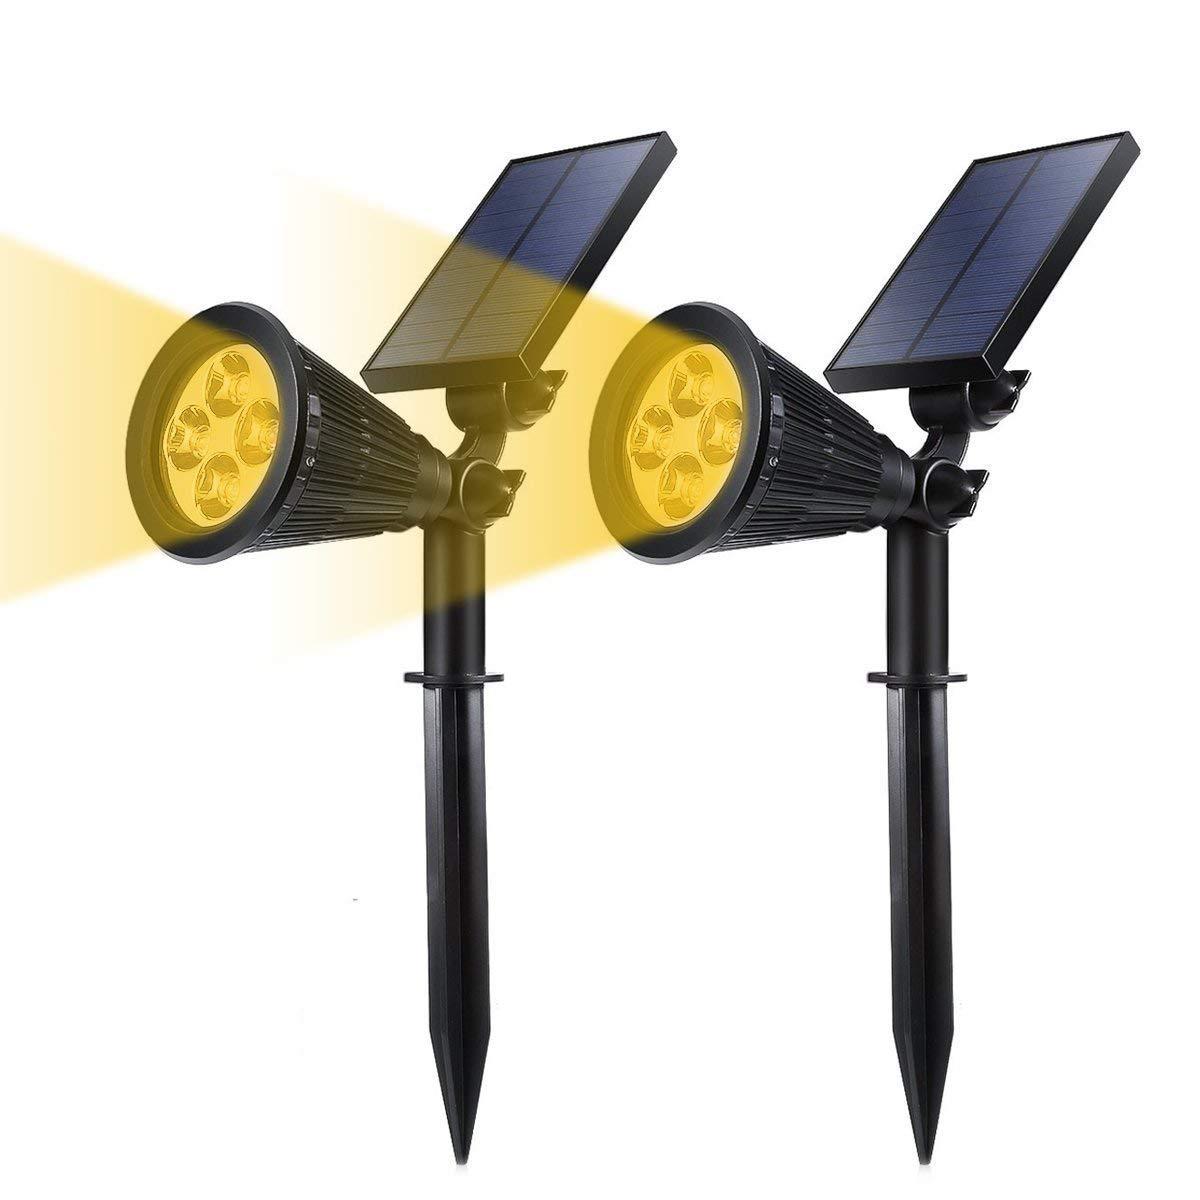 GreenPro Solar Powered LED Garden Spotlight, ProGreen 2-in-1 Waterproof 4 LED Solar Spotlight Adjustable Landscape Solar Lighting Wall Light for Outdoor Garden Decorations (2 Pack, 3000K Warm White)